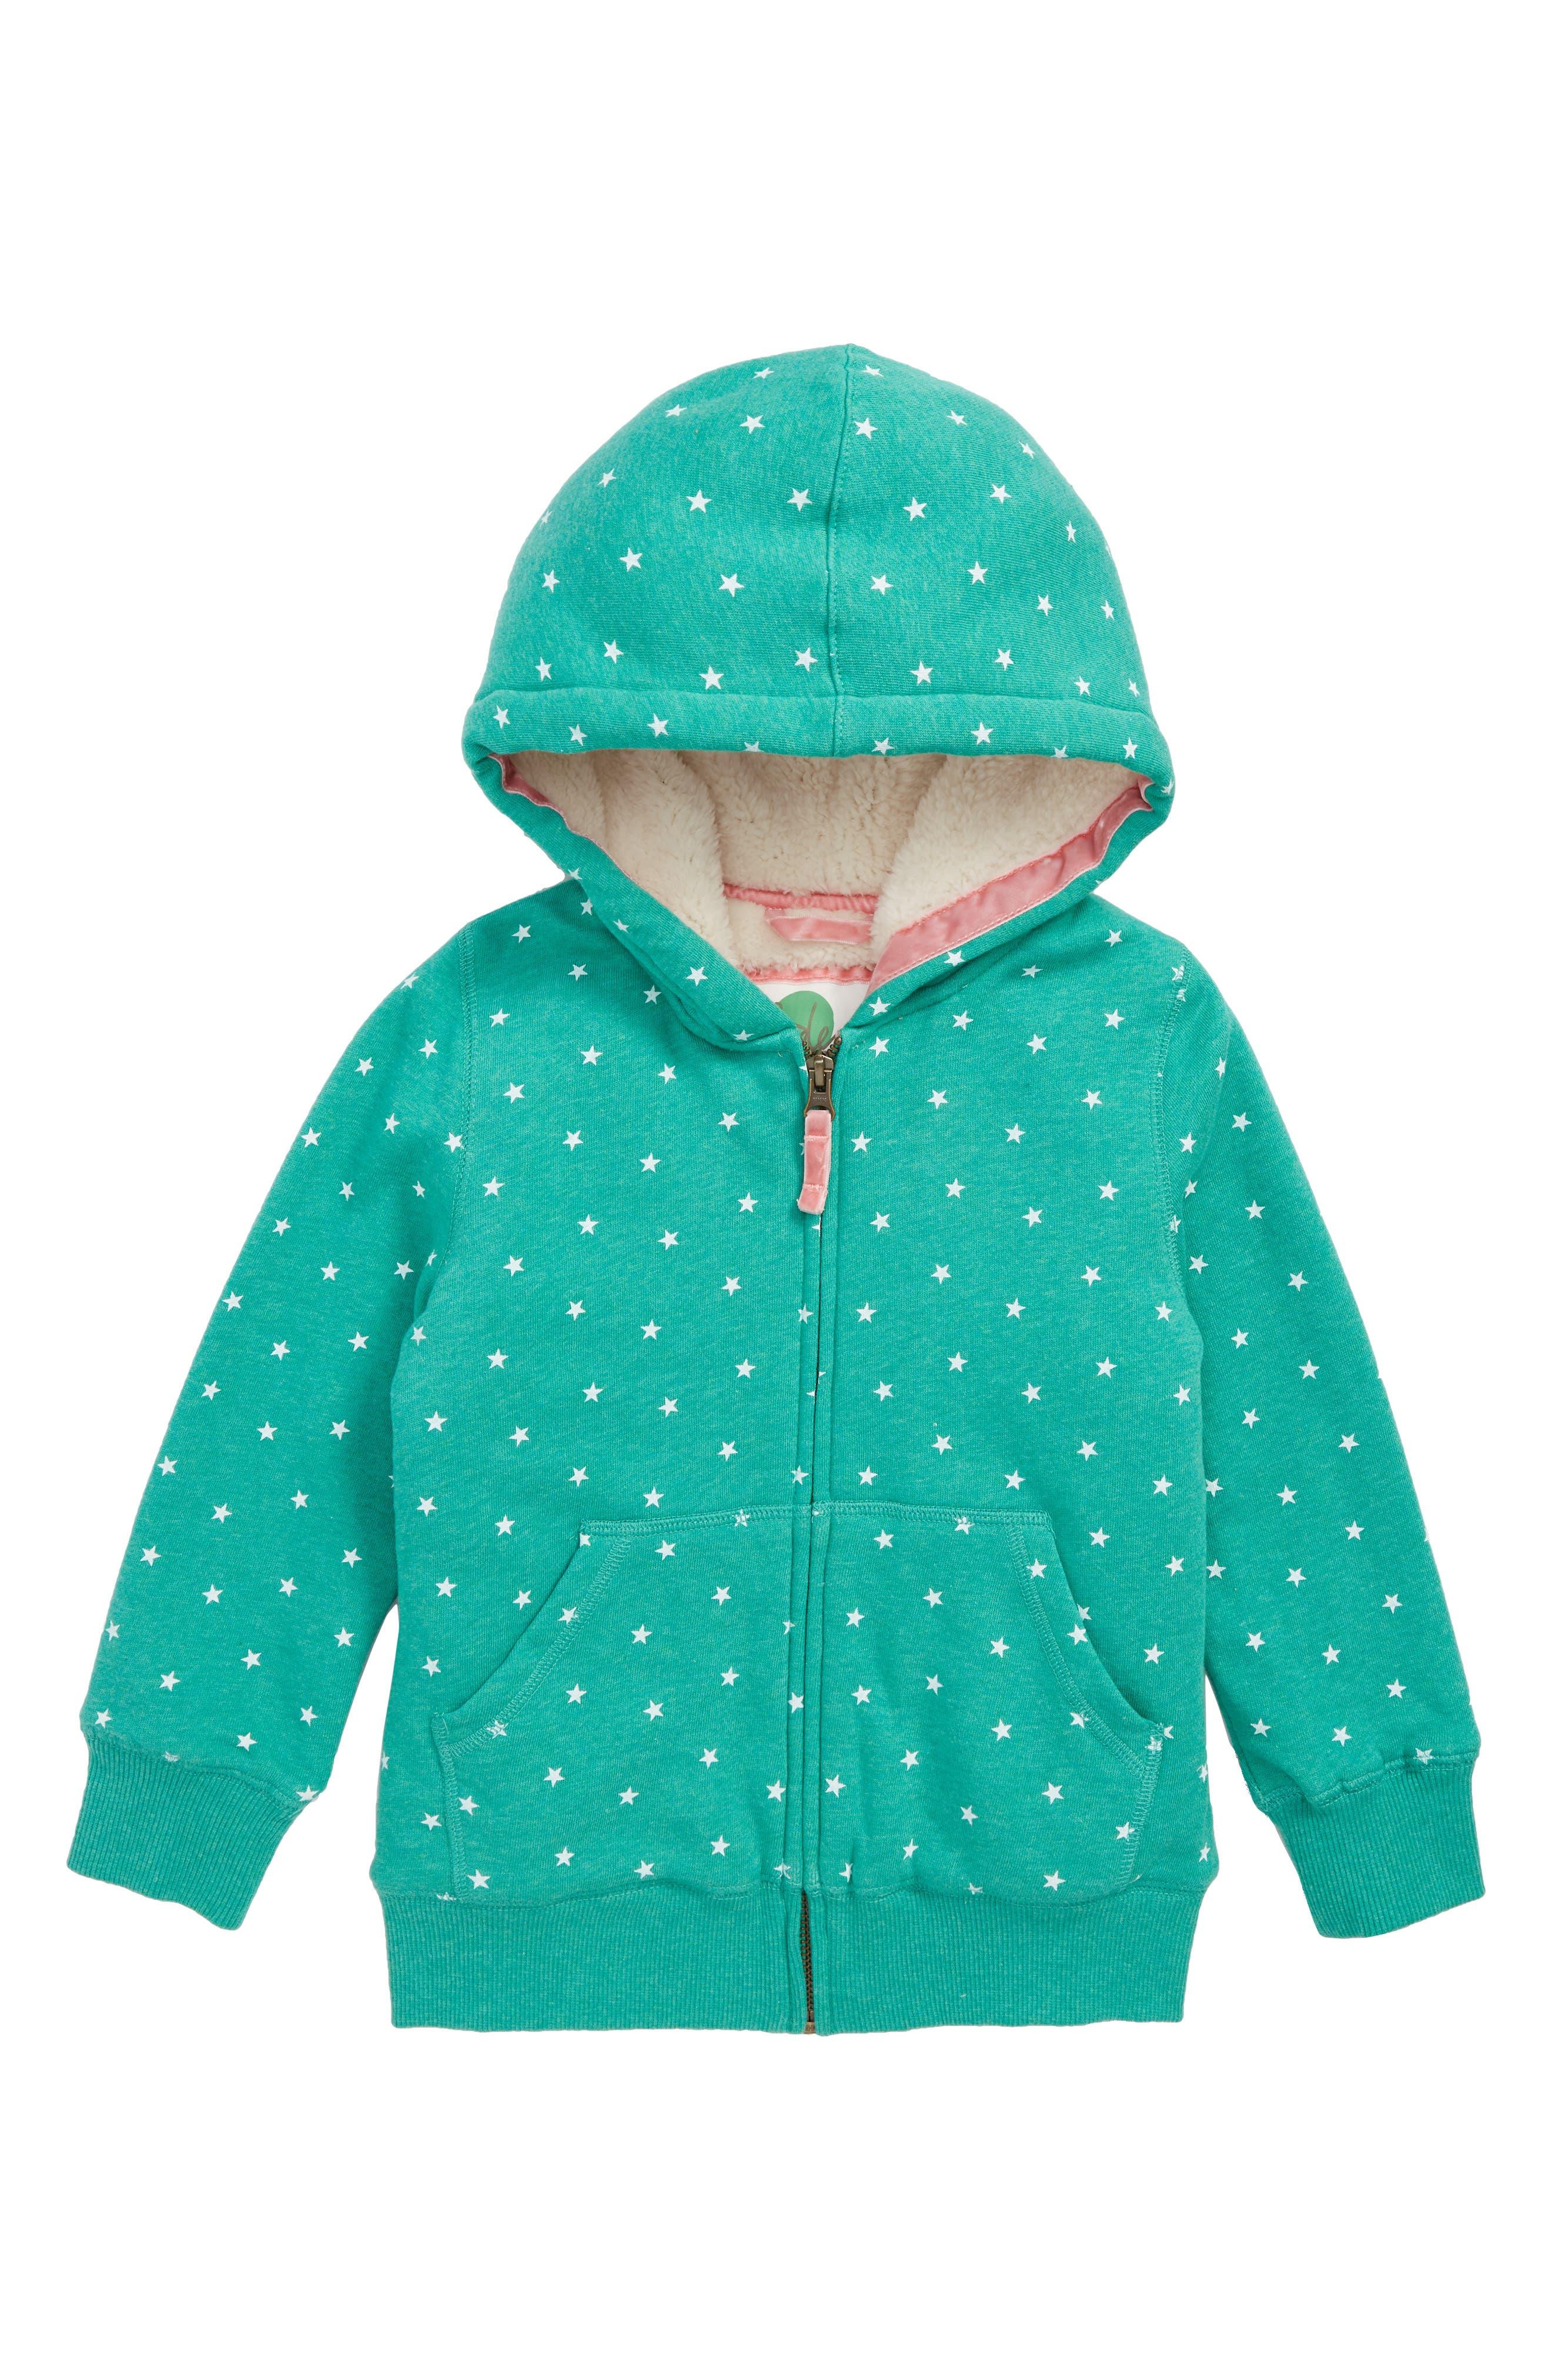 Fleece Lined Zip Hoodie,                             Main thumbnail 1, color,                             JUNGLE GREEN MARLE/ ECRU STARS